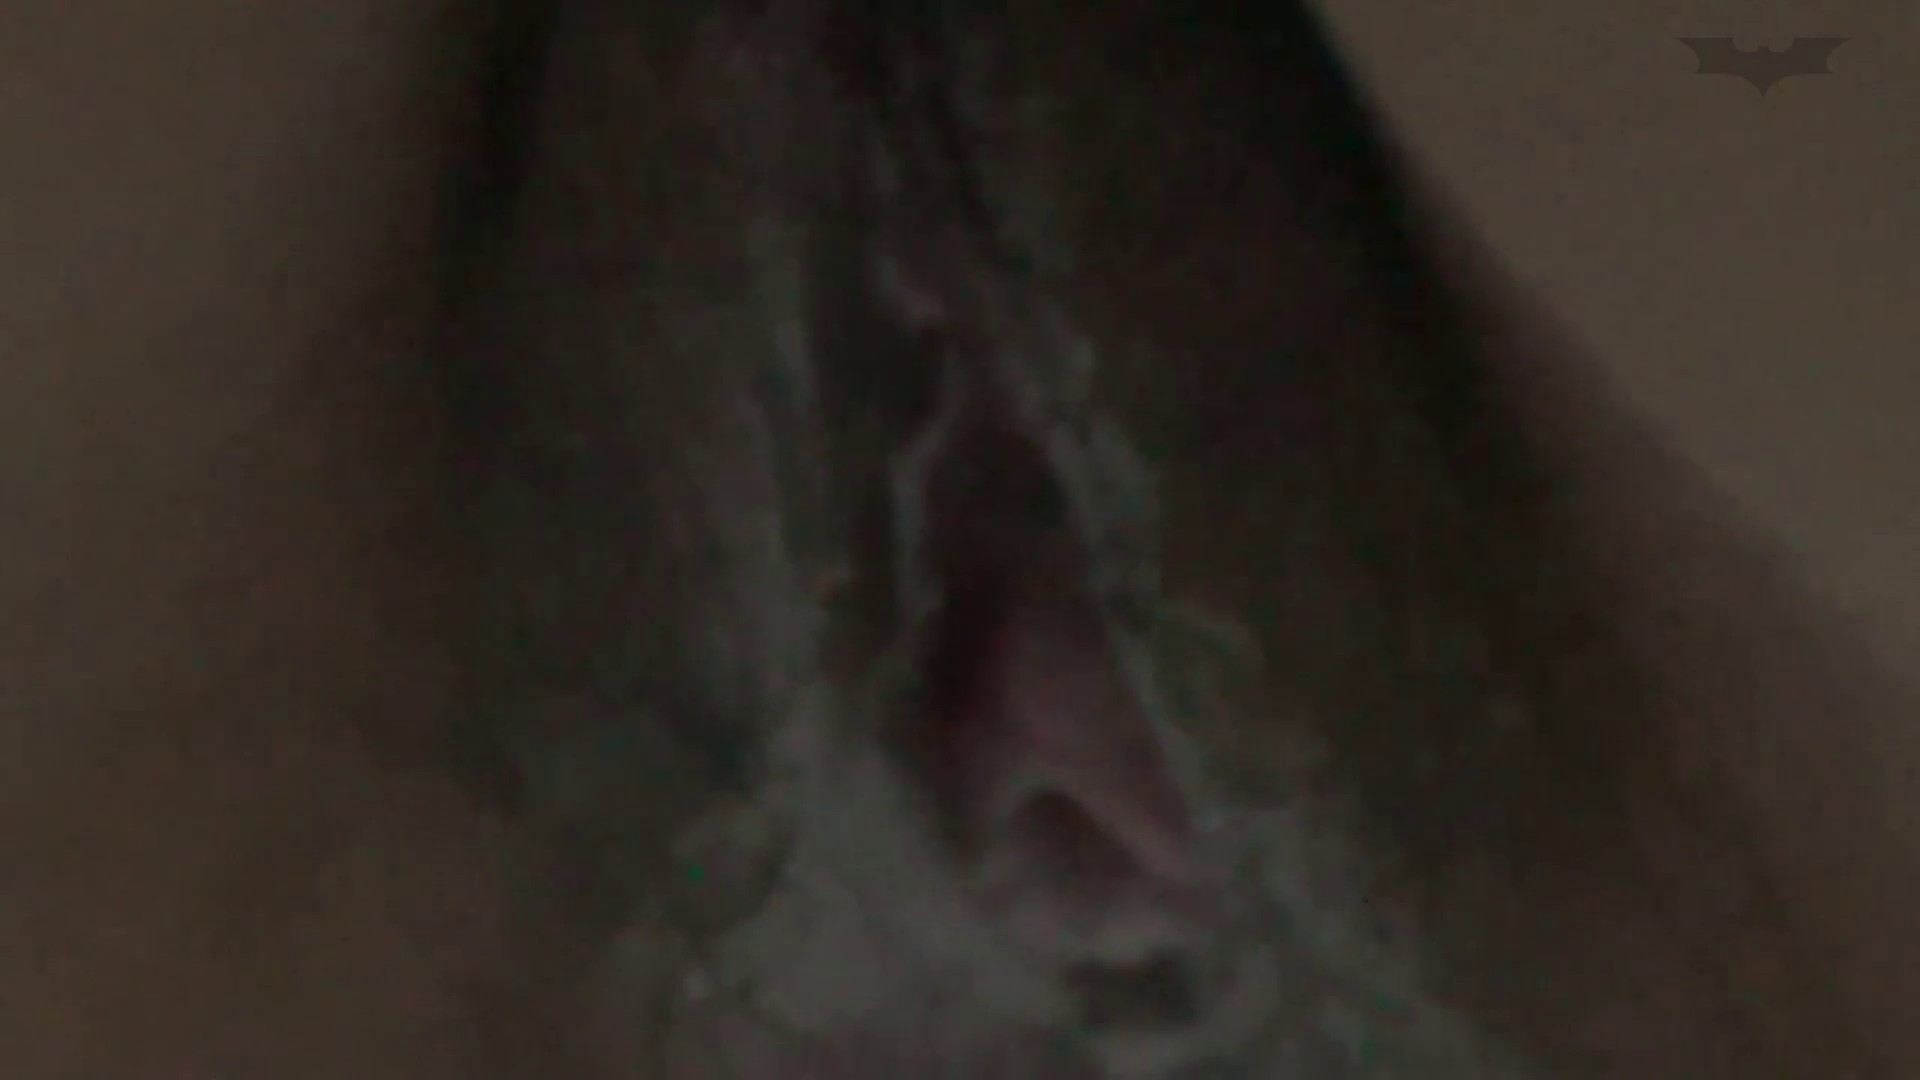 JD盗撮 美女の洗面所の秘密 Vol.44 OLの実態 盗み撮り動画キャプチャ 98pic 82